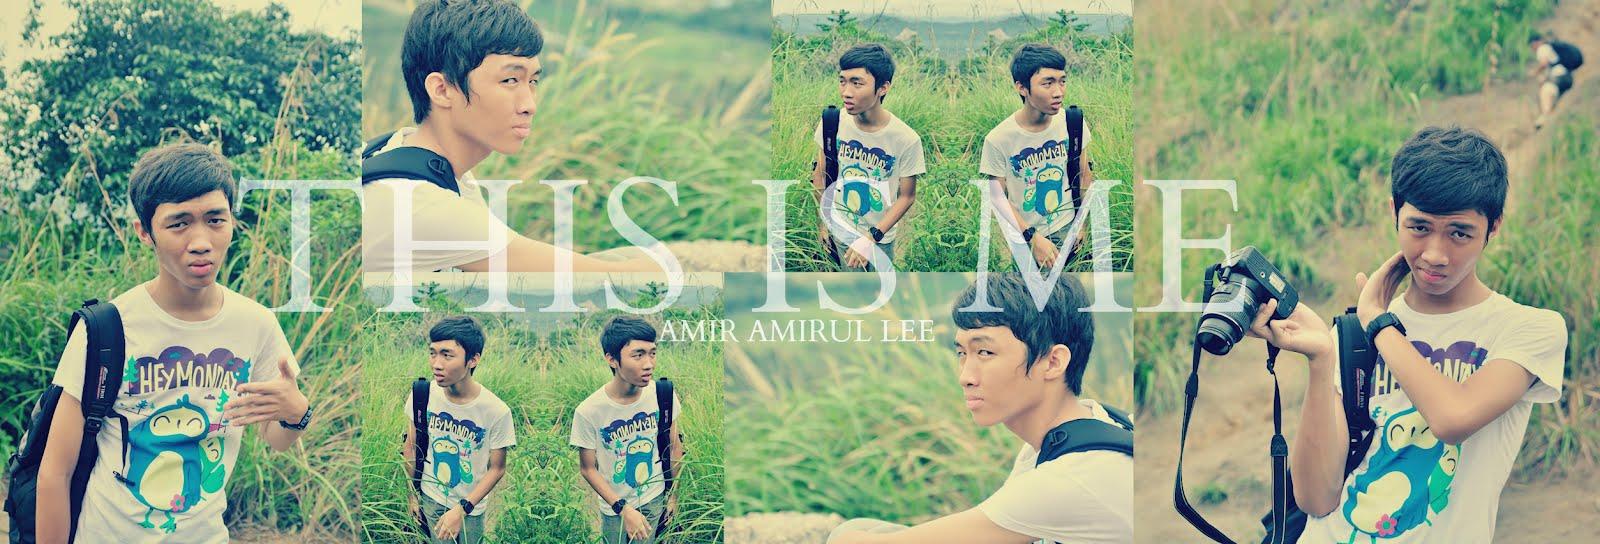 Amir Amirul Lee